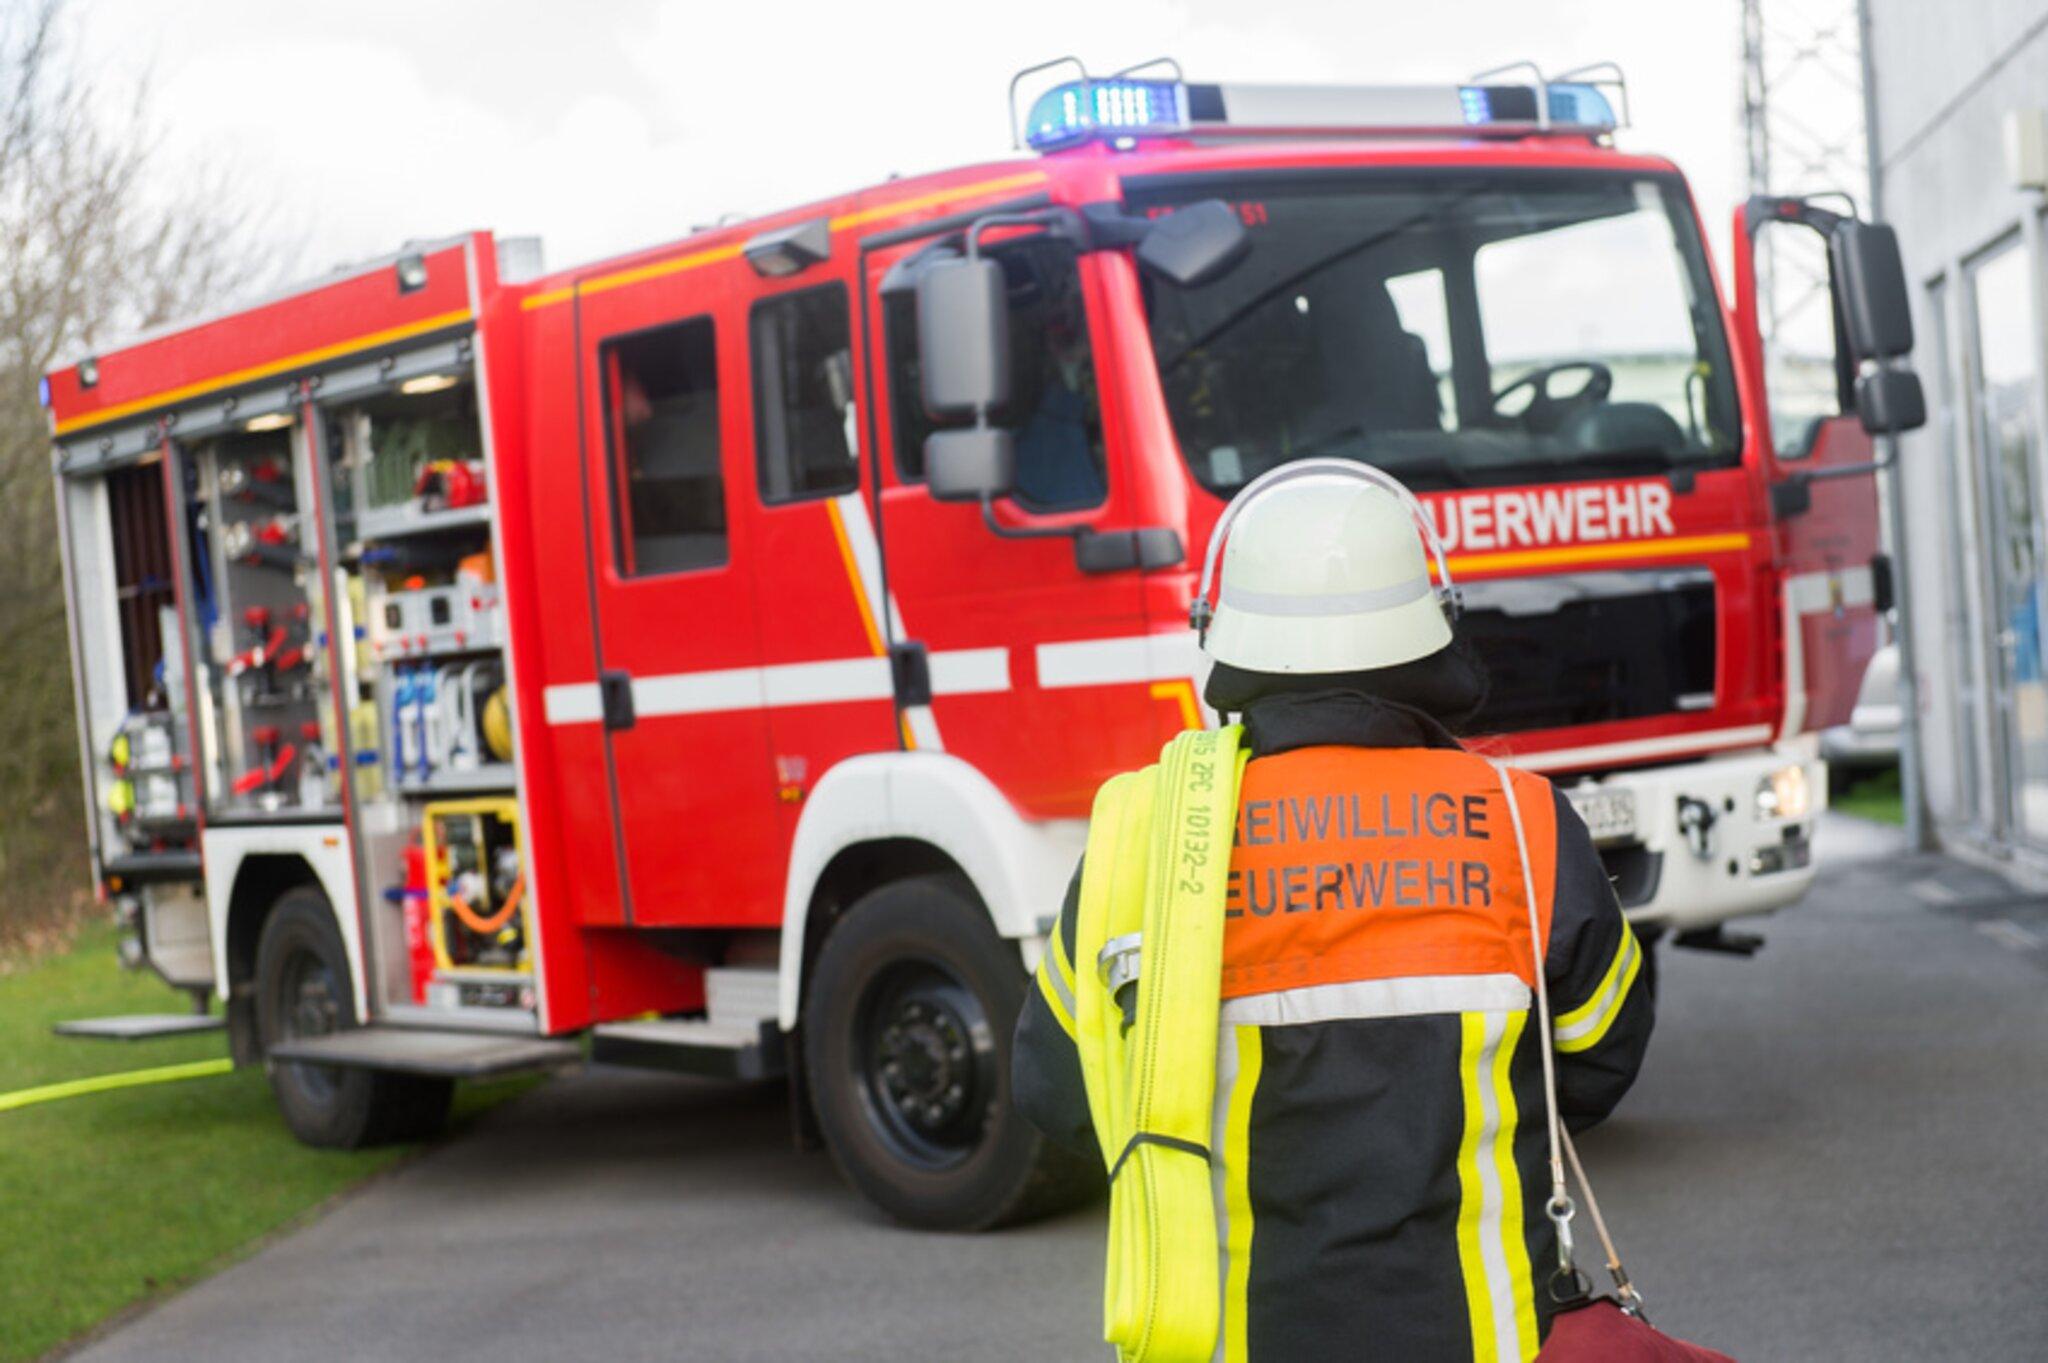 Raum-Obernburg-K-chenbrand-Kleinunfall-Pkw-besch-digt-E-Scooter-ohne-Versicherung-Mobiles-Cafe-aufgebrochen